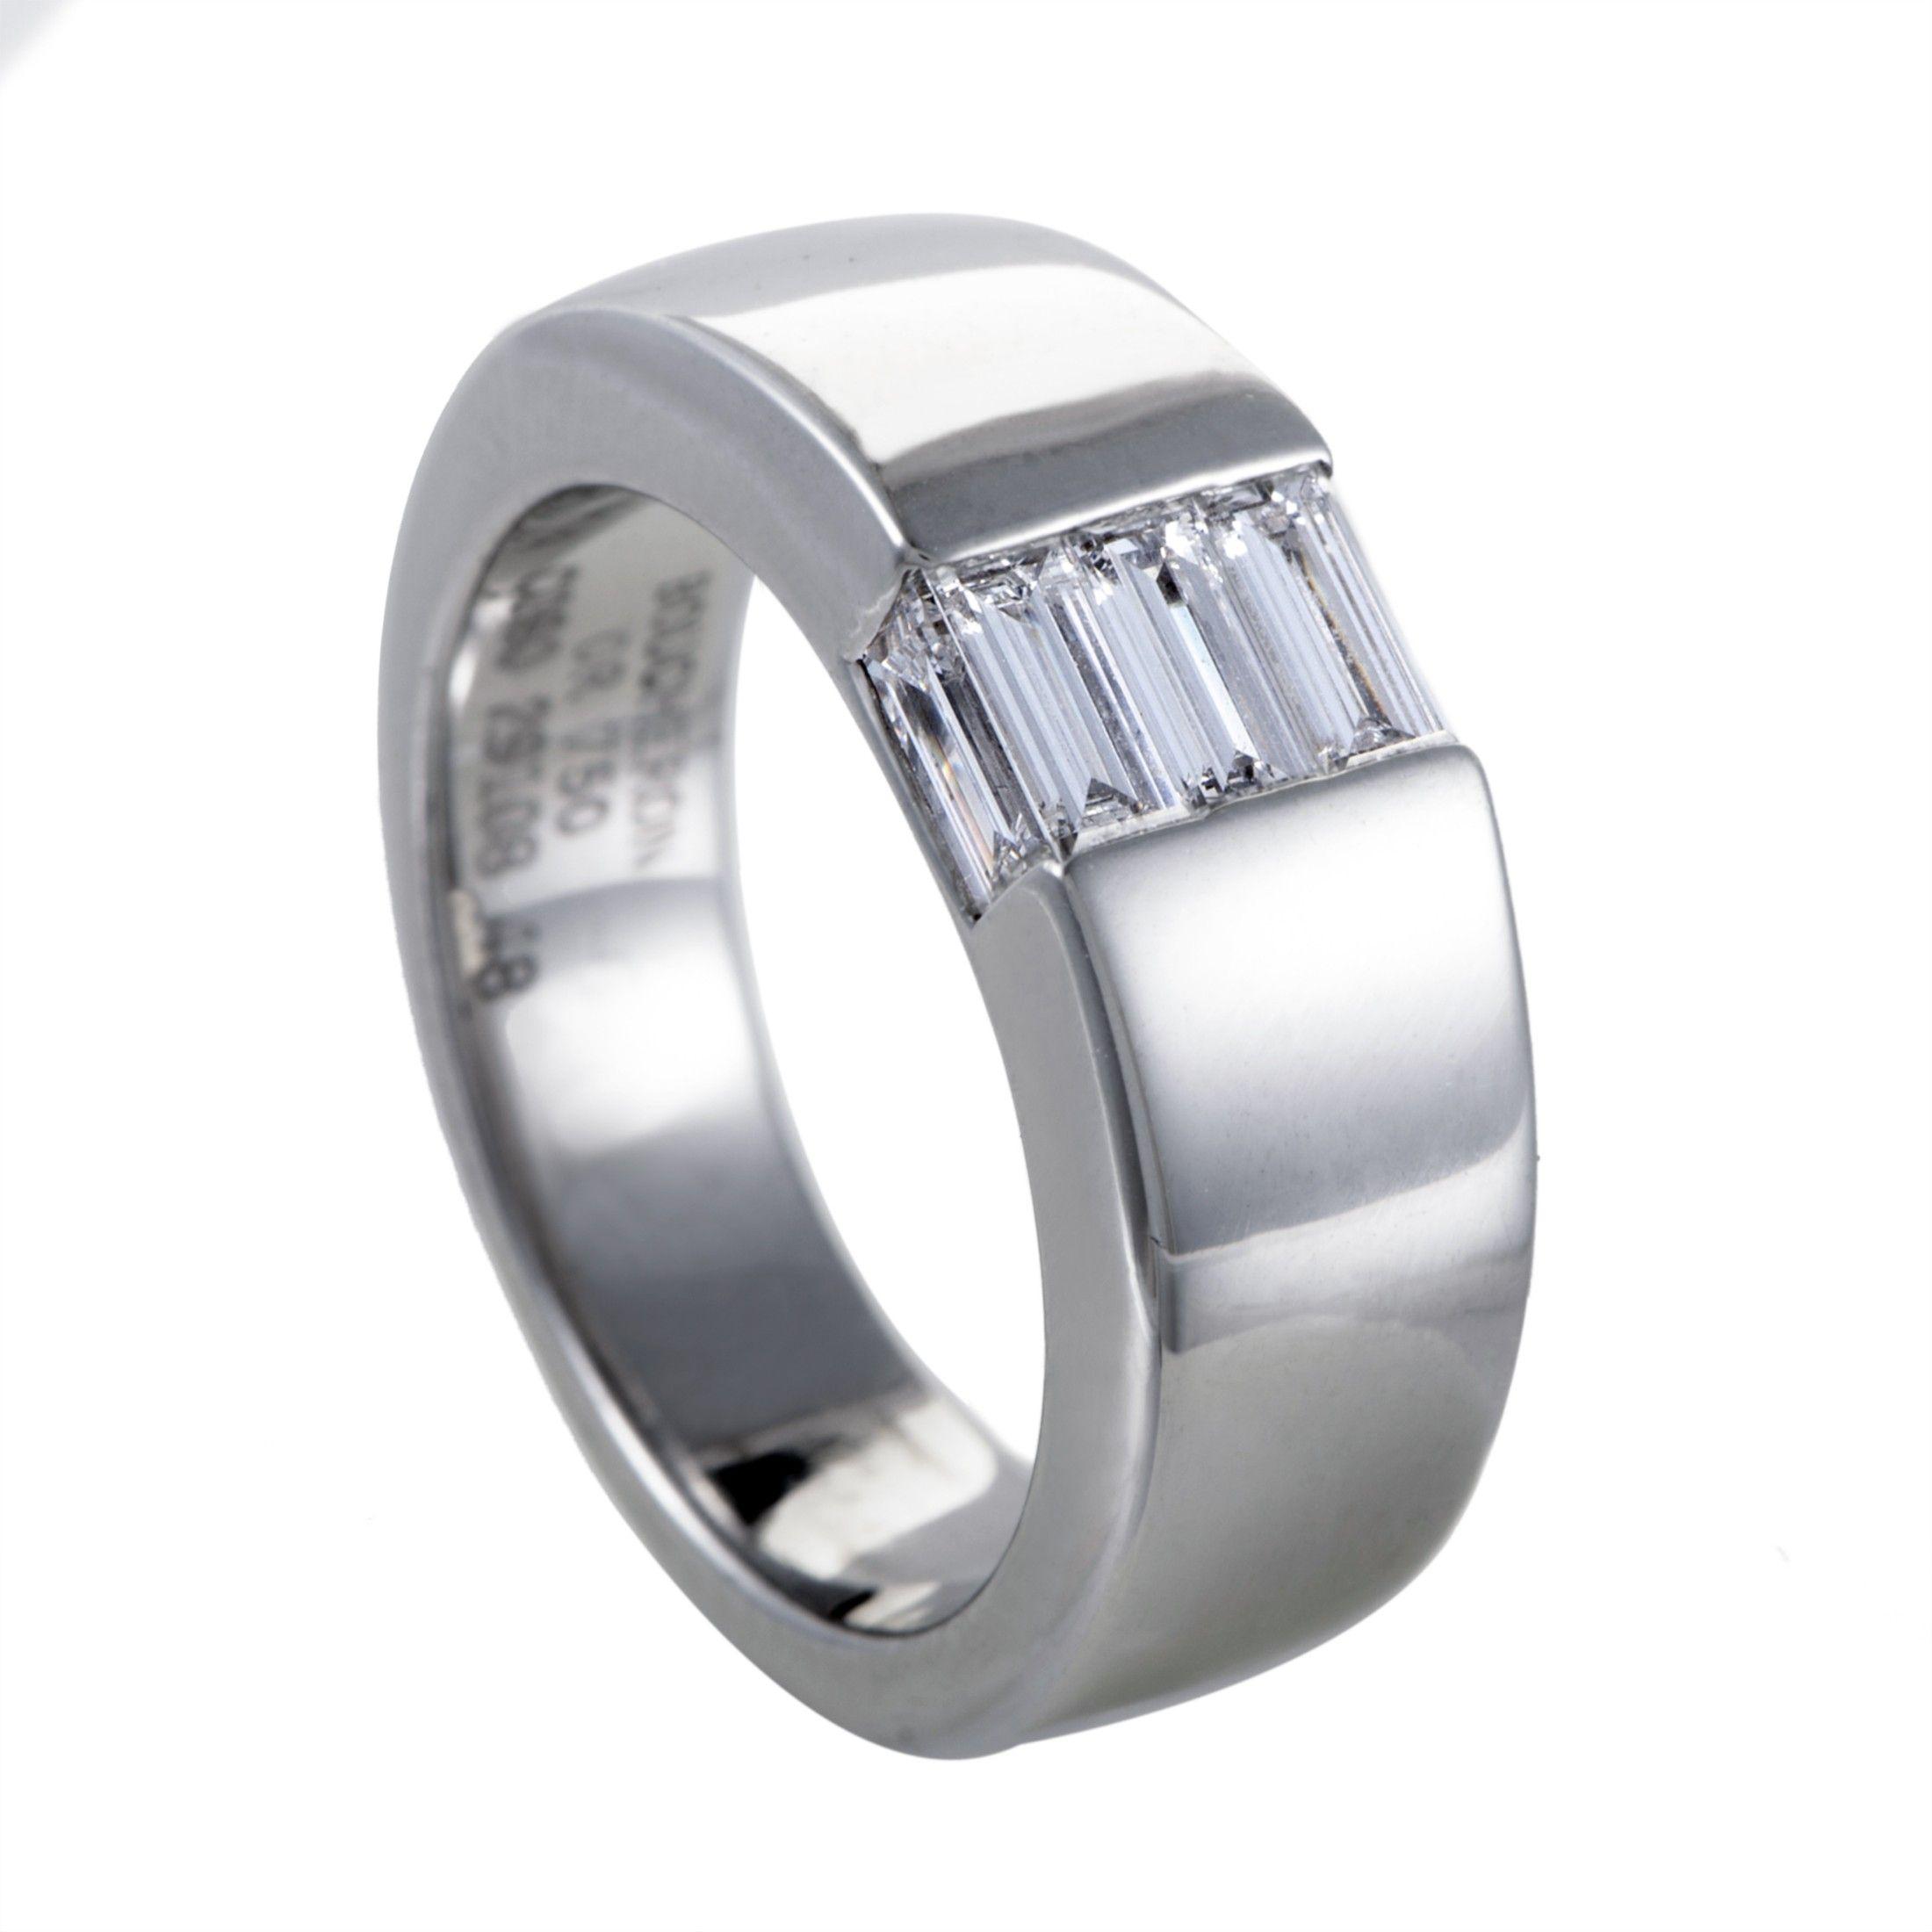 895c0b3699a Shop Boucheron Womens 18K White Gold Diamond Baguette Band Ring for ...